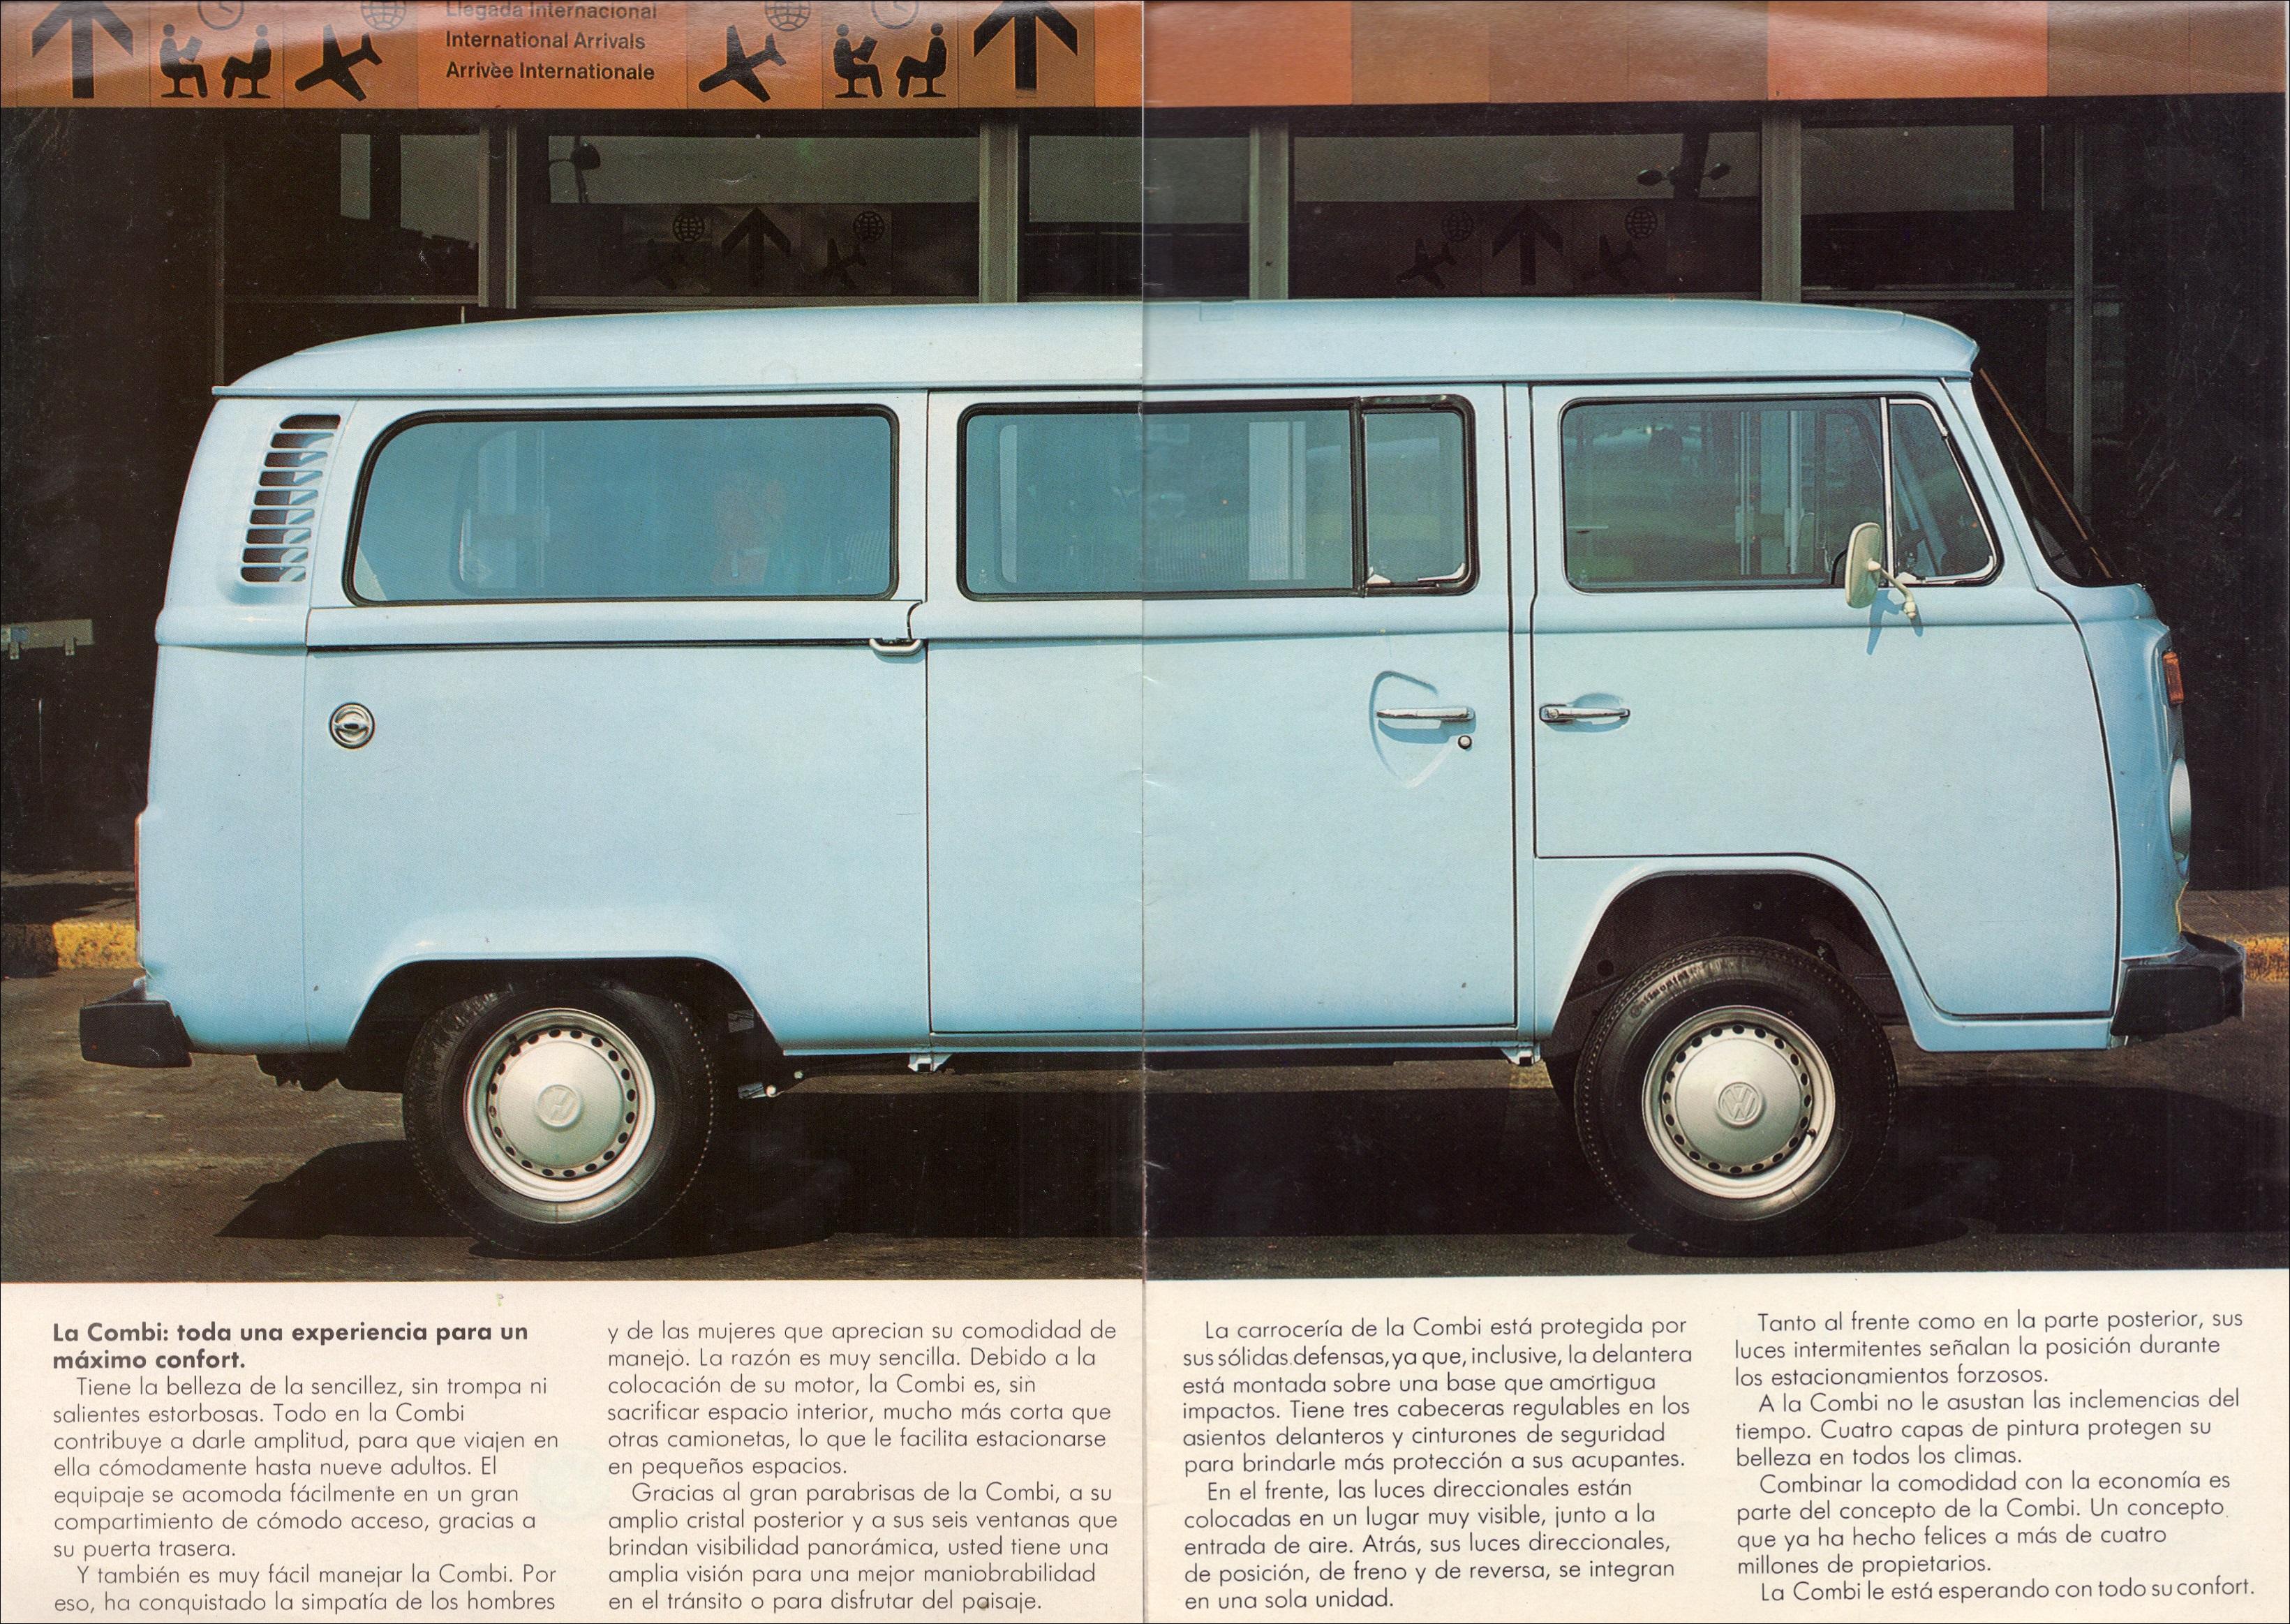 vw archives 1982 vw bus combi mexico. Black Bedroom Furniture Sets. Home Design Ideas